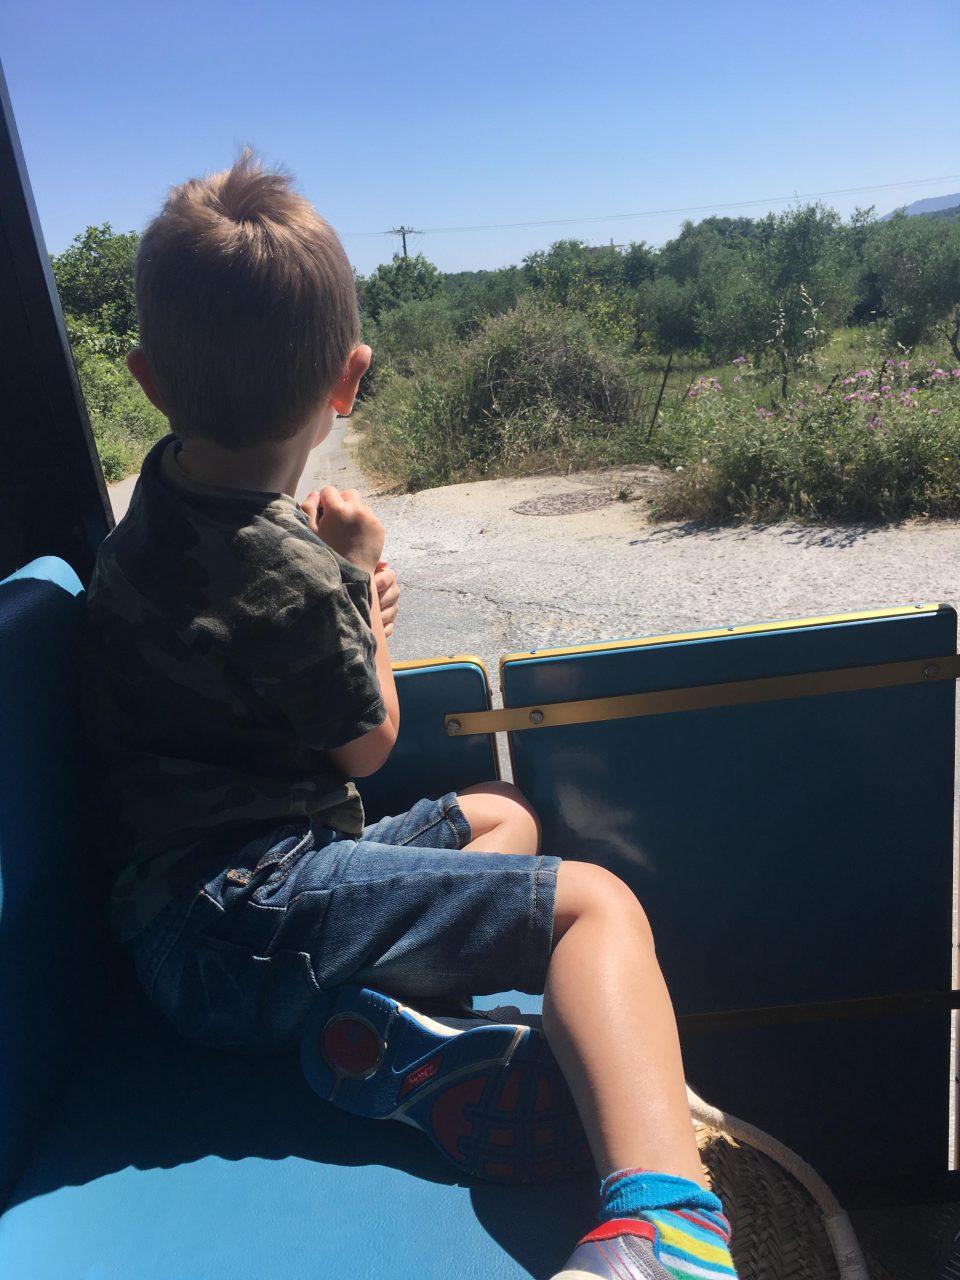 Jake on the land train